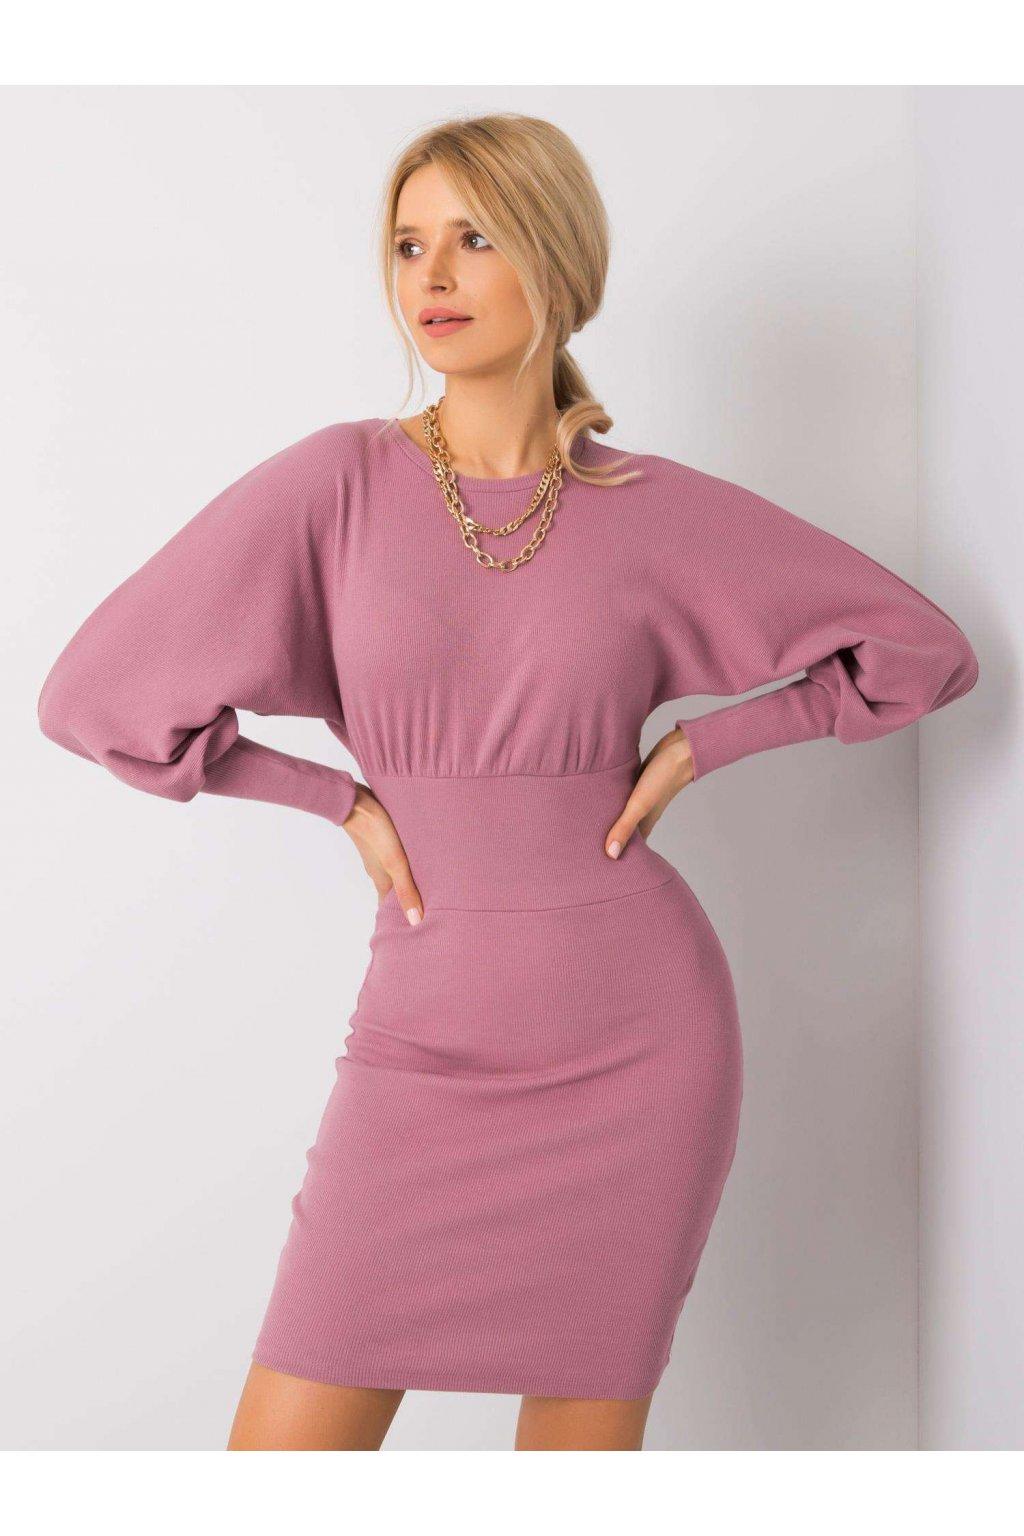 pol pl Wrzosowa sukienka Leticia RUE PARIS 358296 4